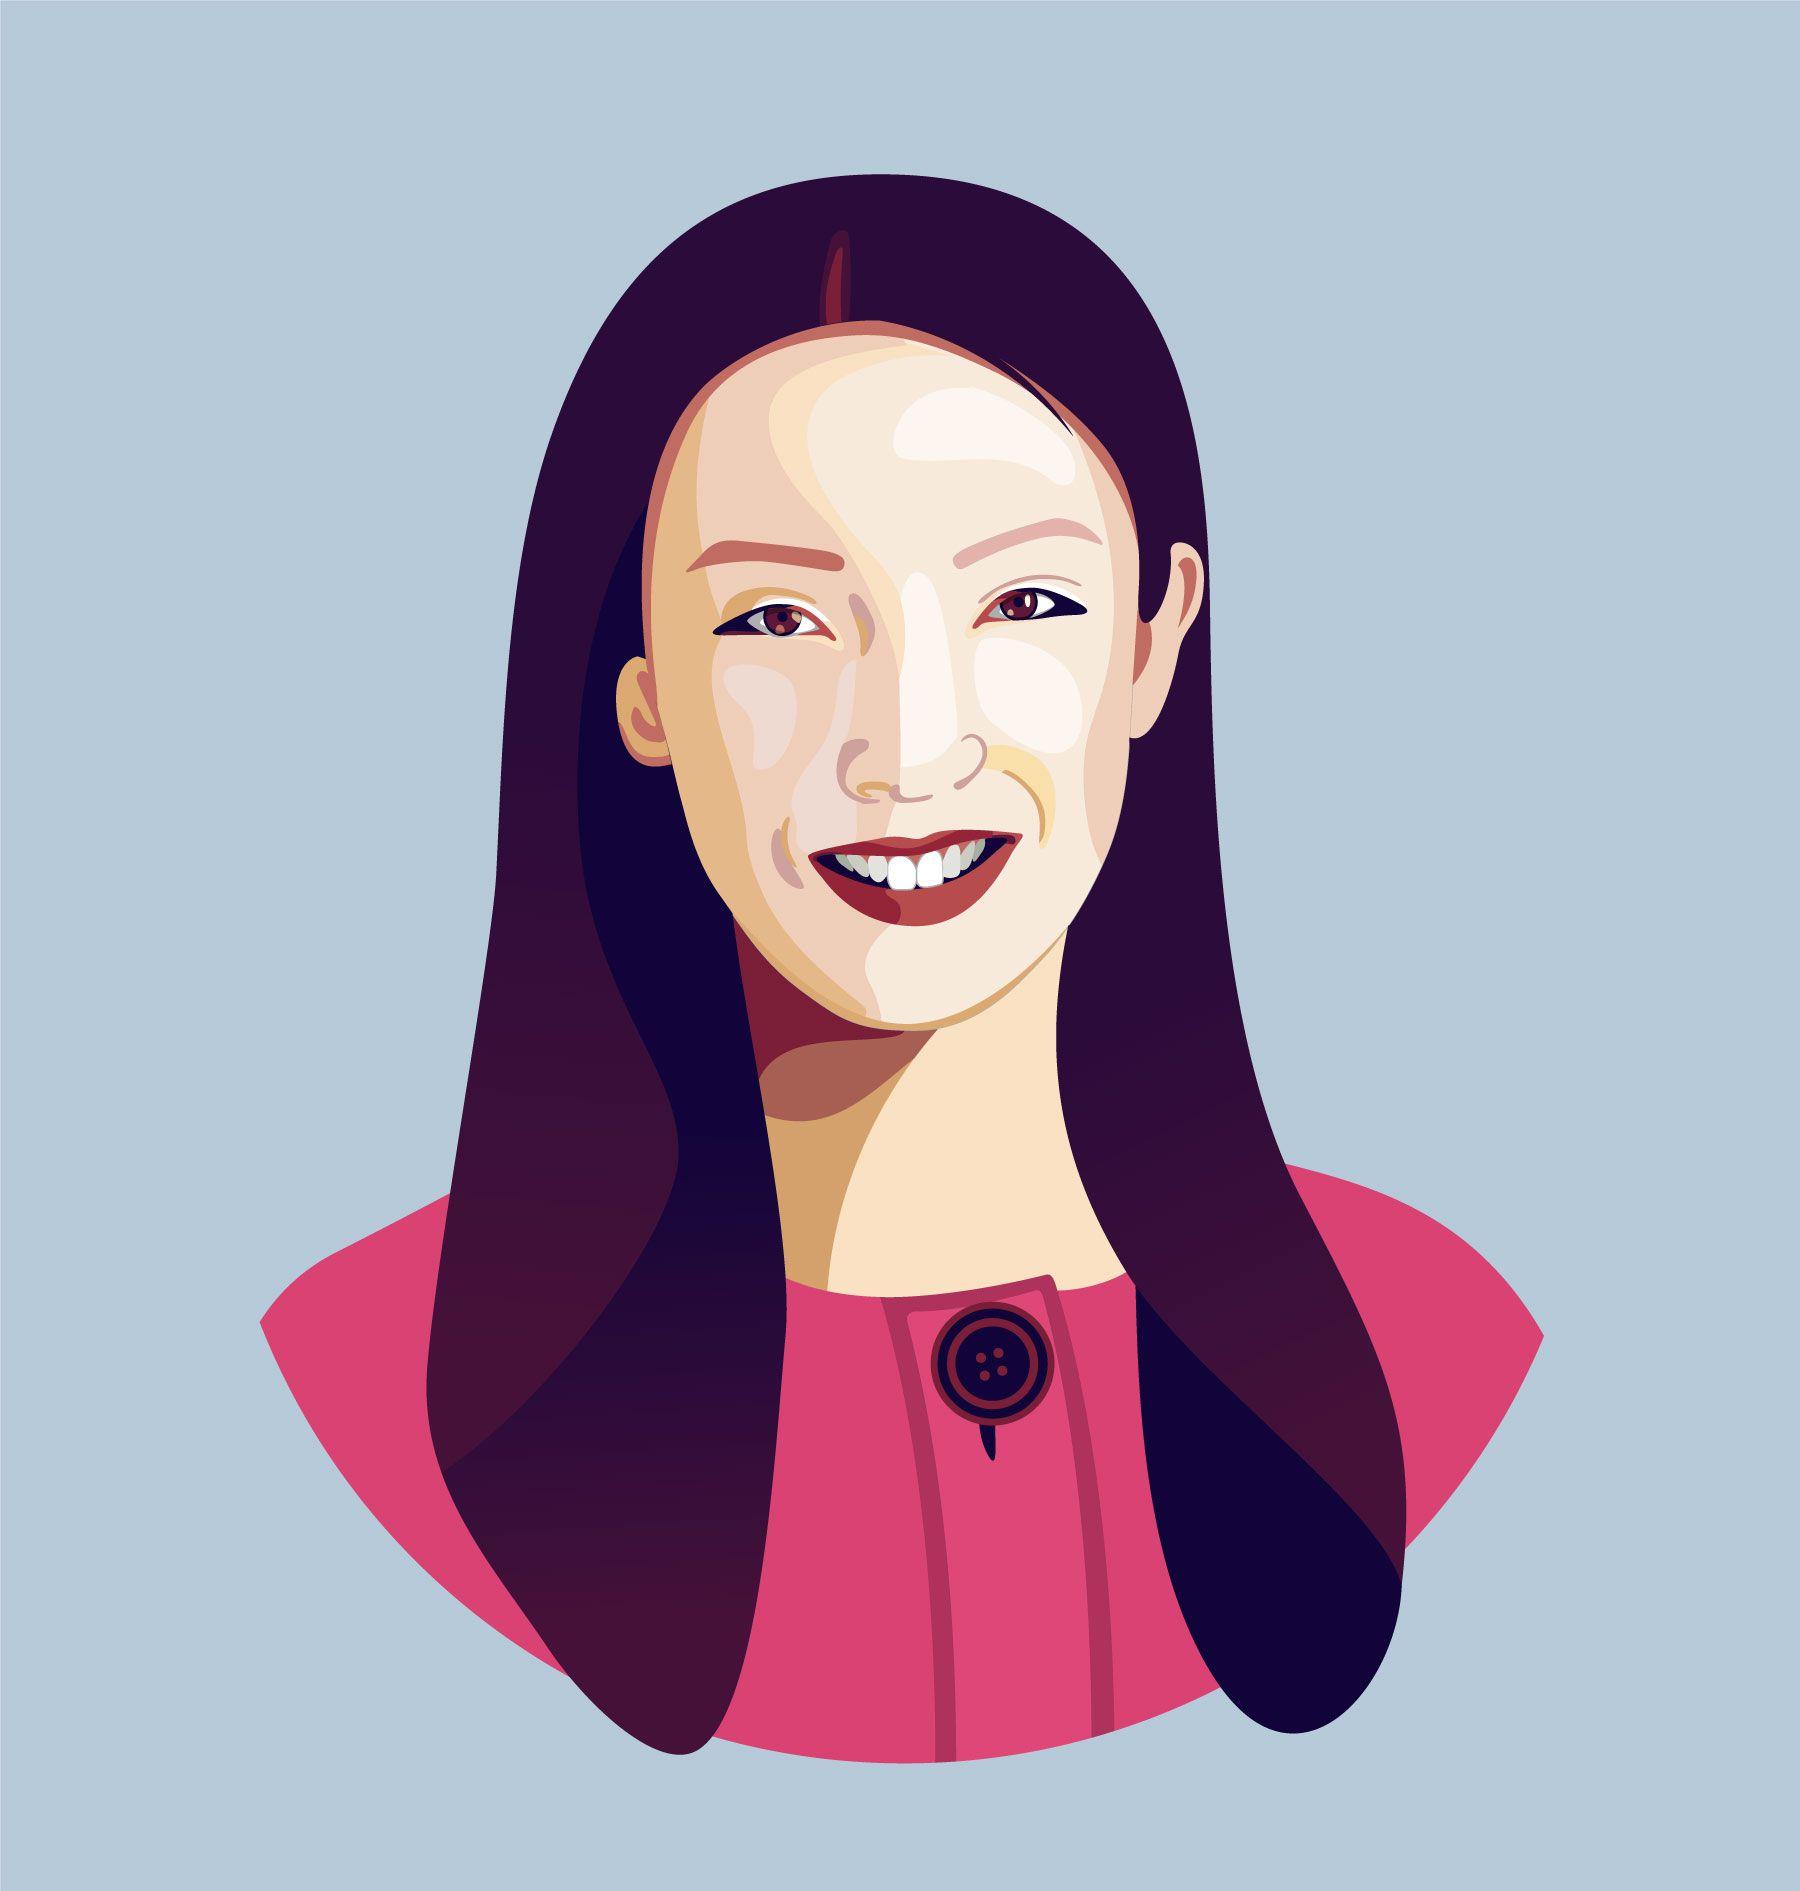 Clara Shih portrait illustration